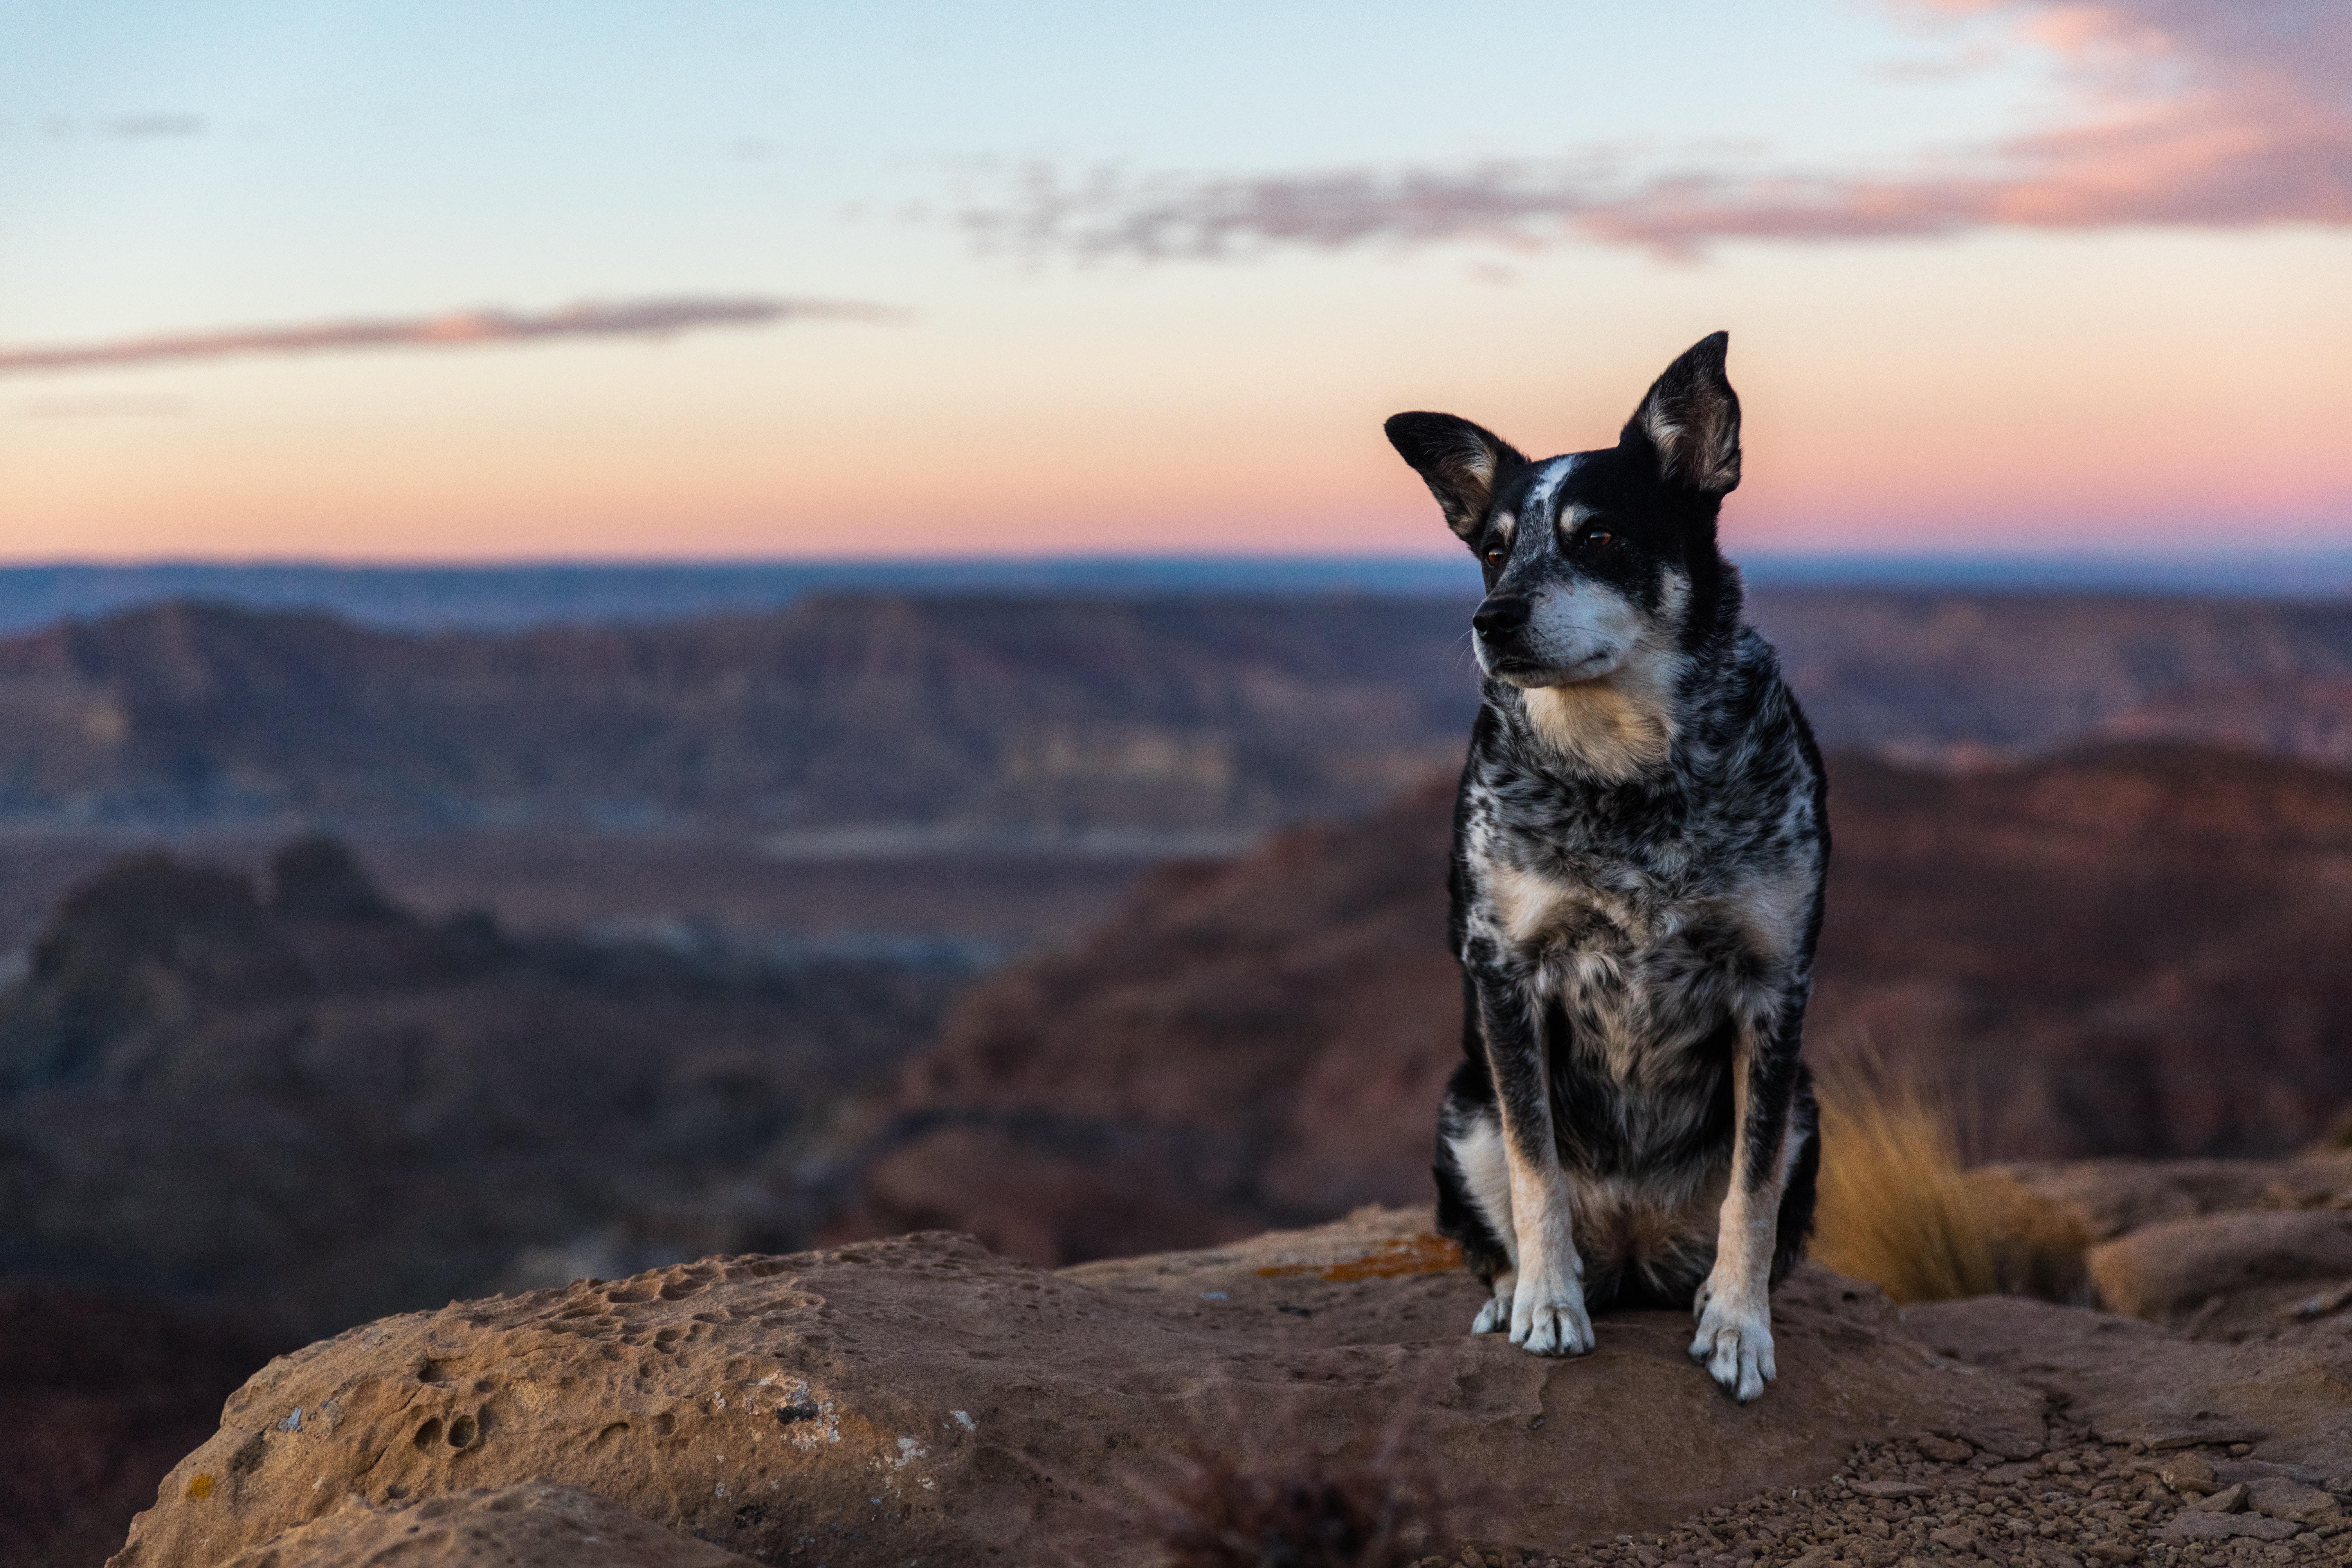 short-coated black and white dog sitting on rock during daytime